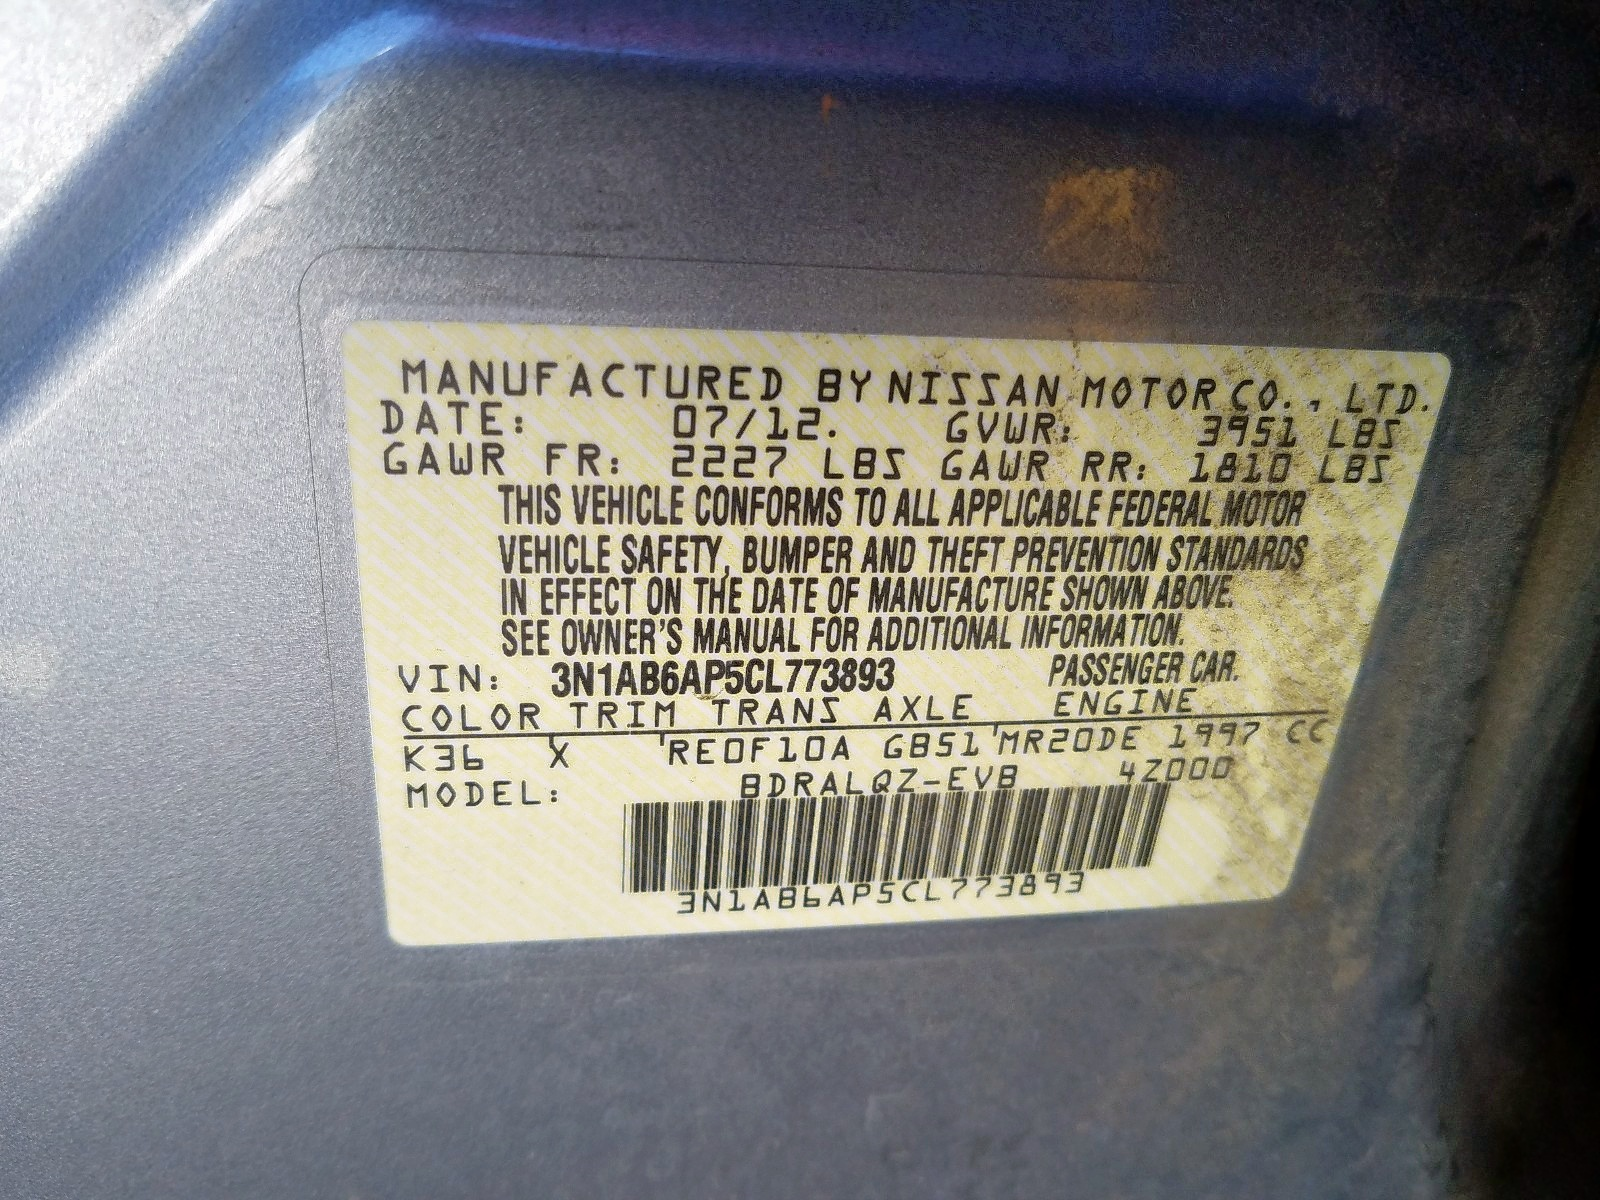 3N1AB6AP5CL773893 - 2012 Nissan Sentra 2.0 2.0L